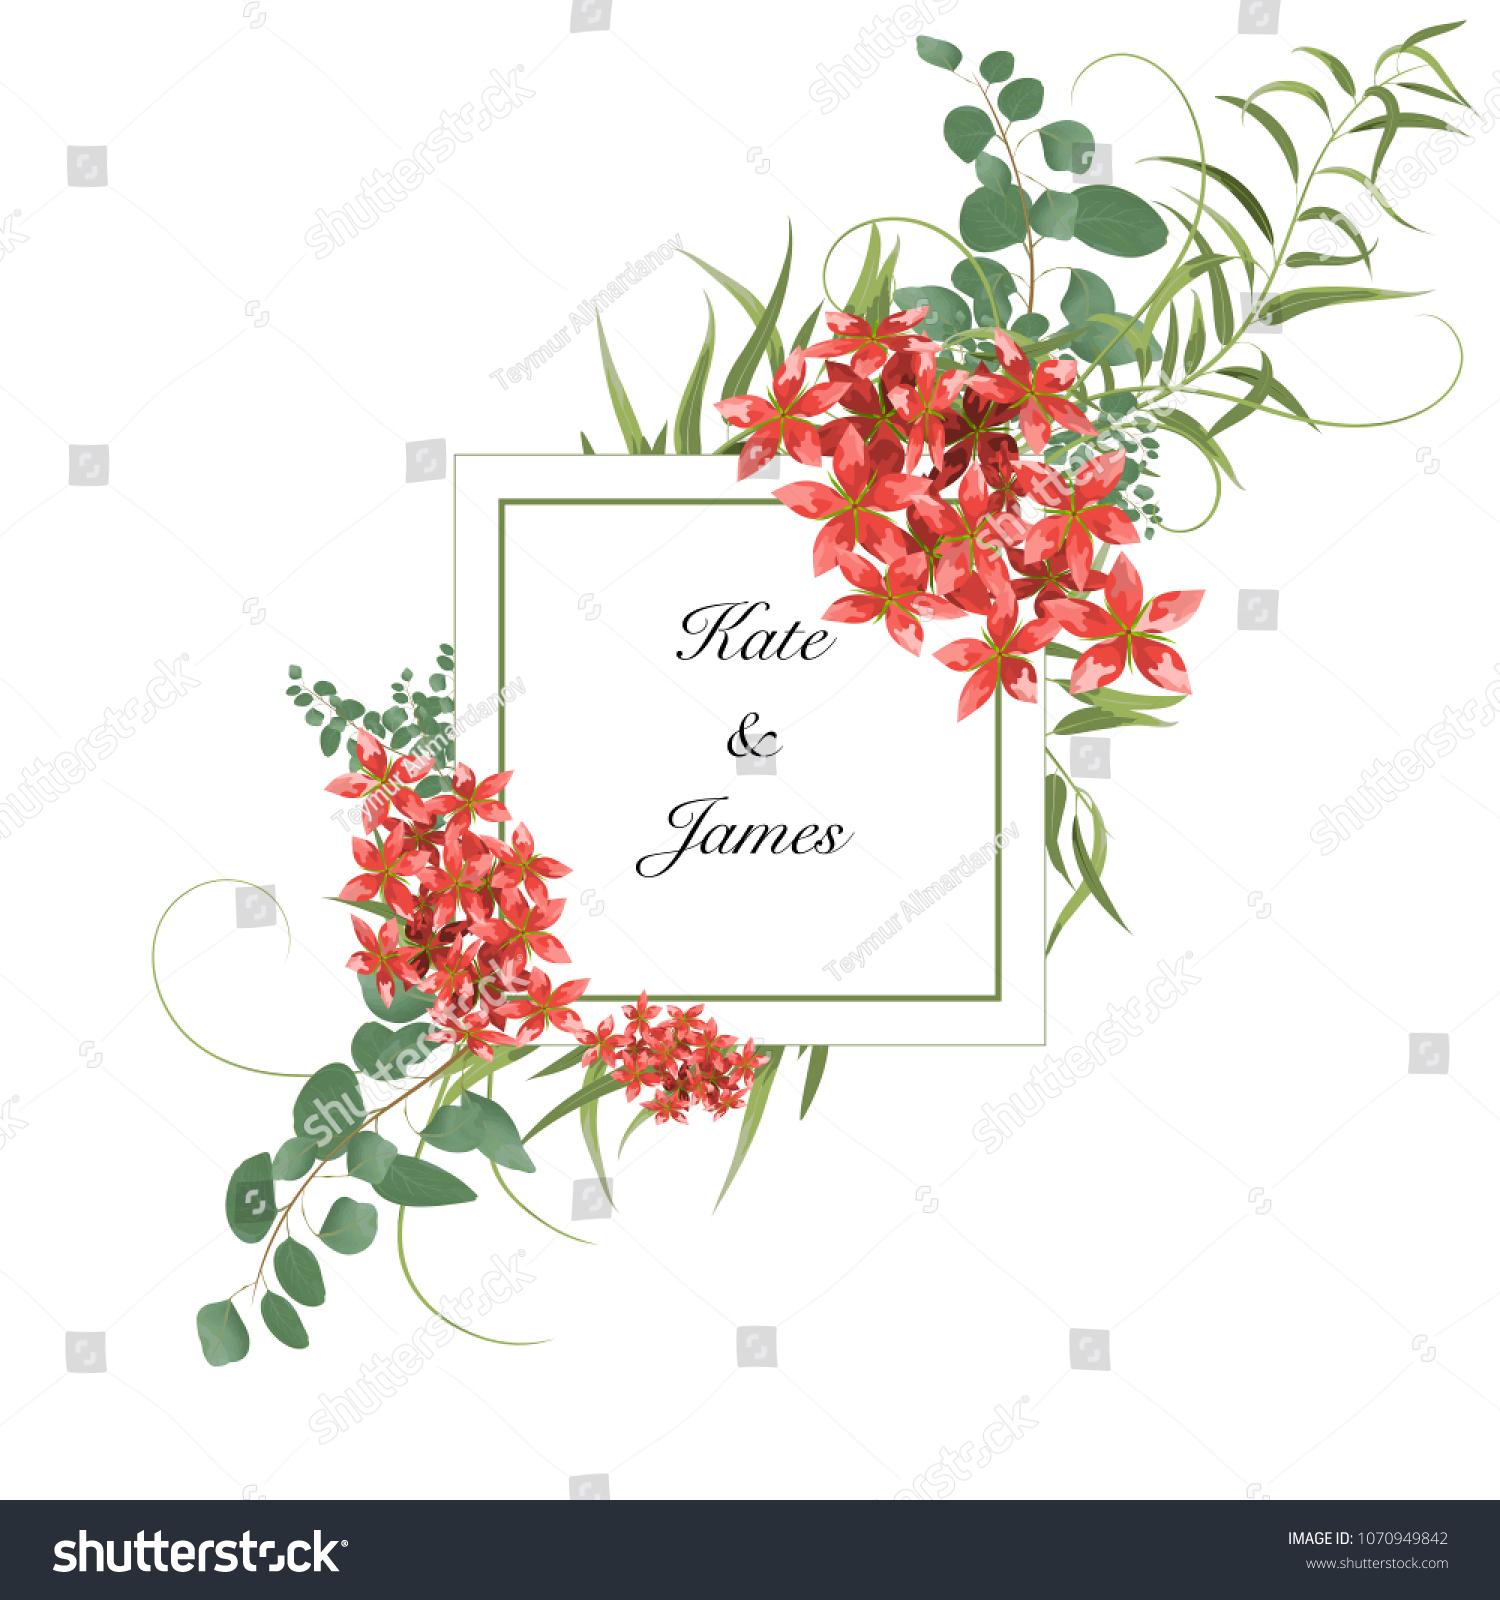 Floral Art Wedding Invitation Card Design Stock Vector 1070949842 ...